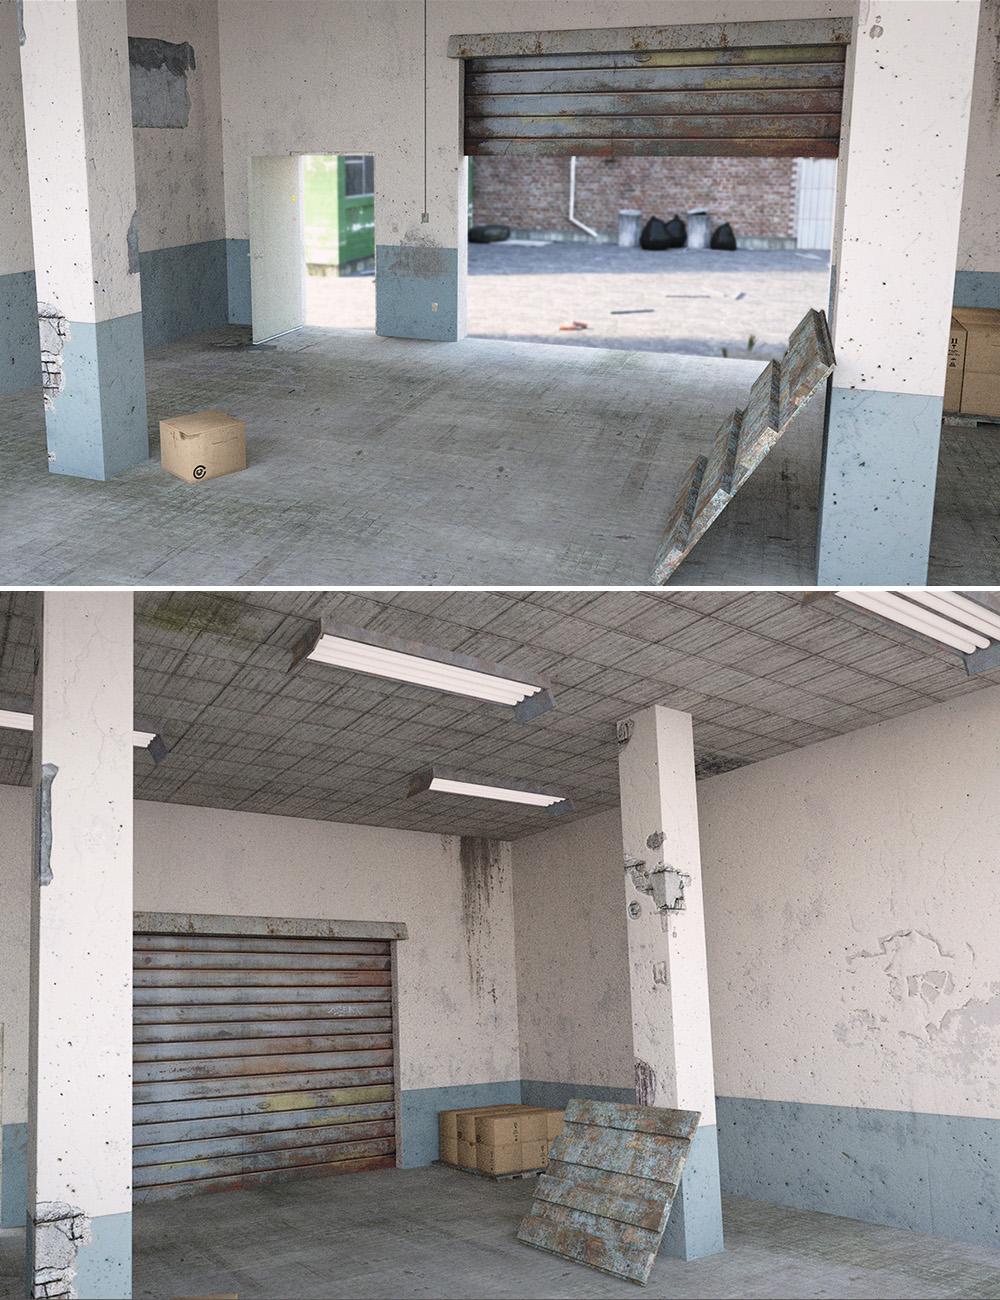 Industrial Storage Unit Interior by: , 3D Models by Daz 3D